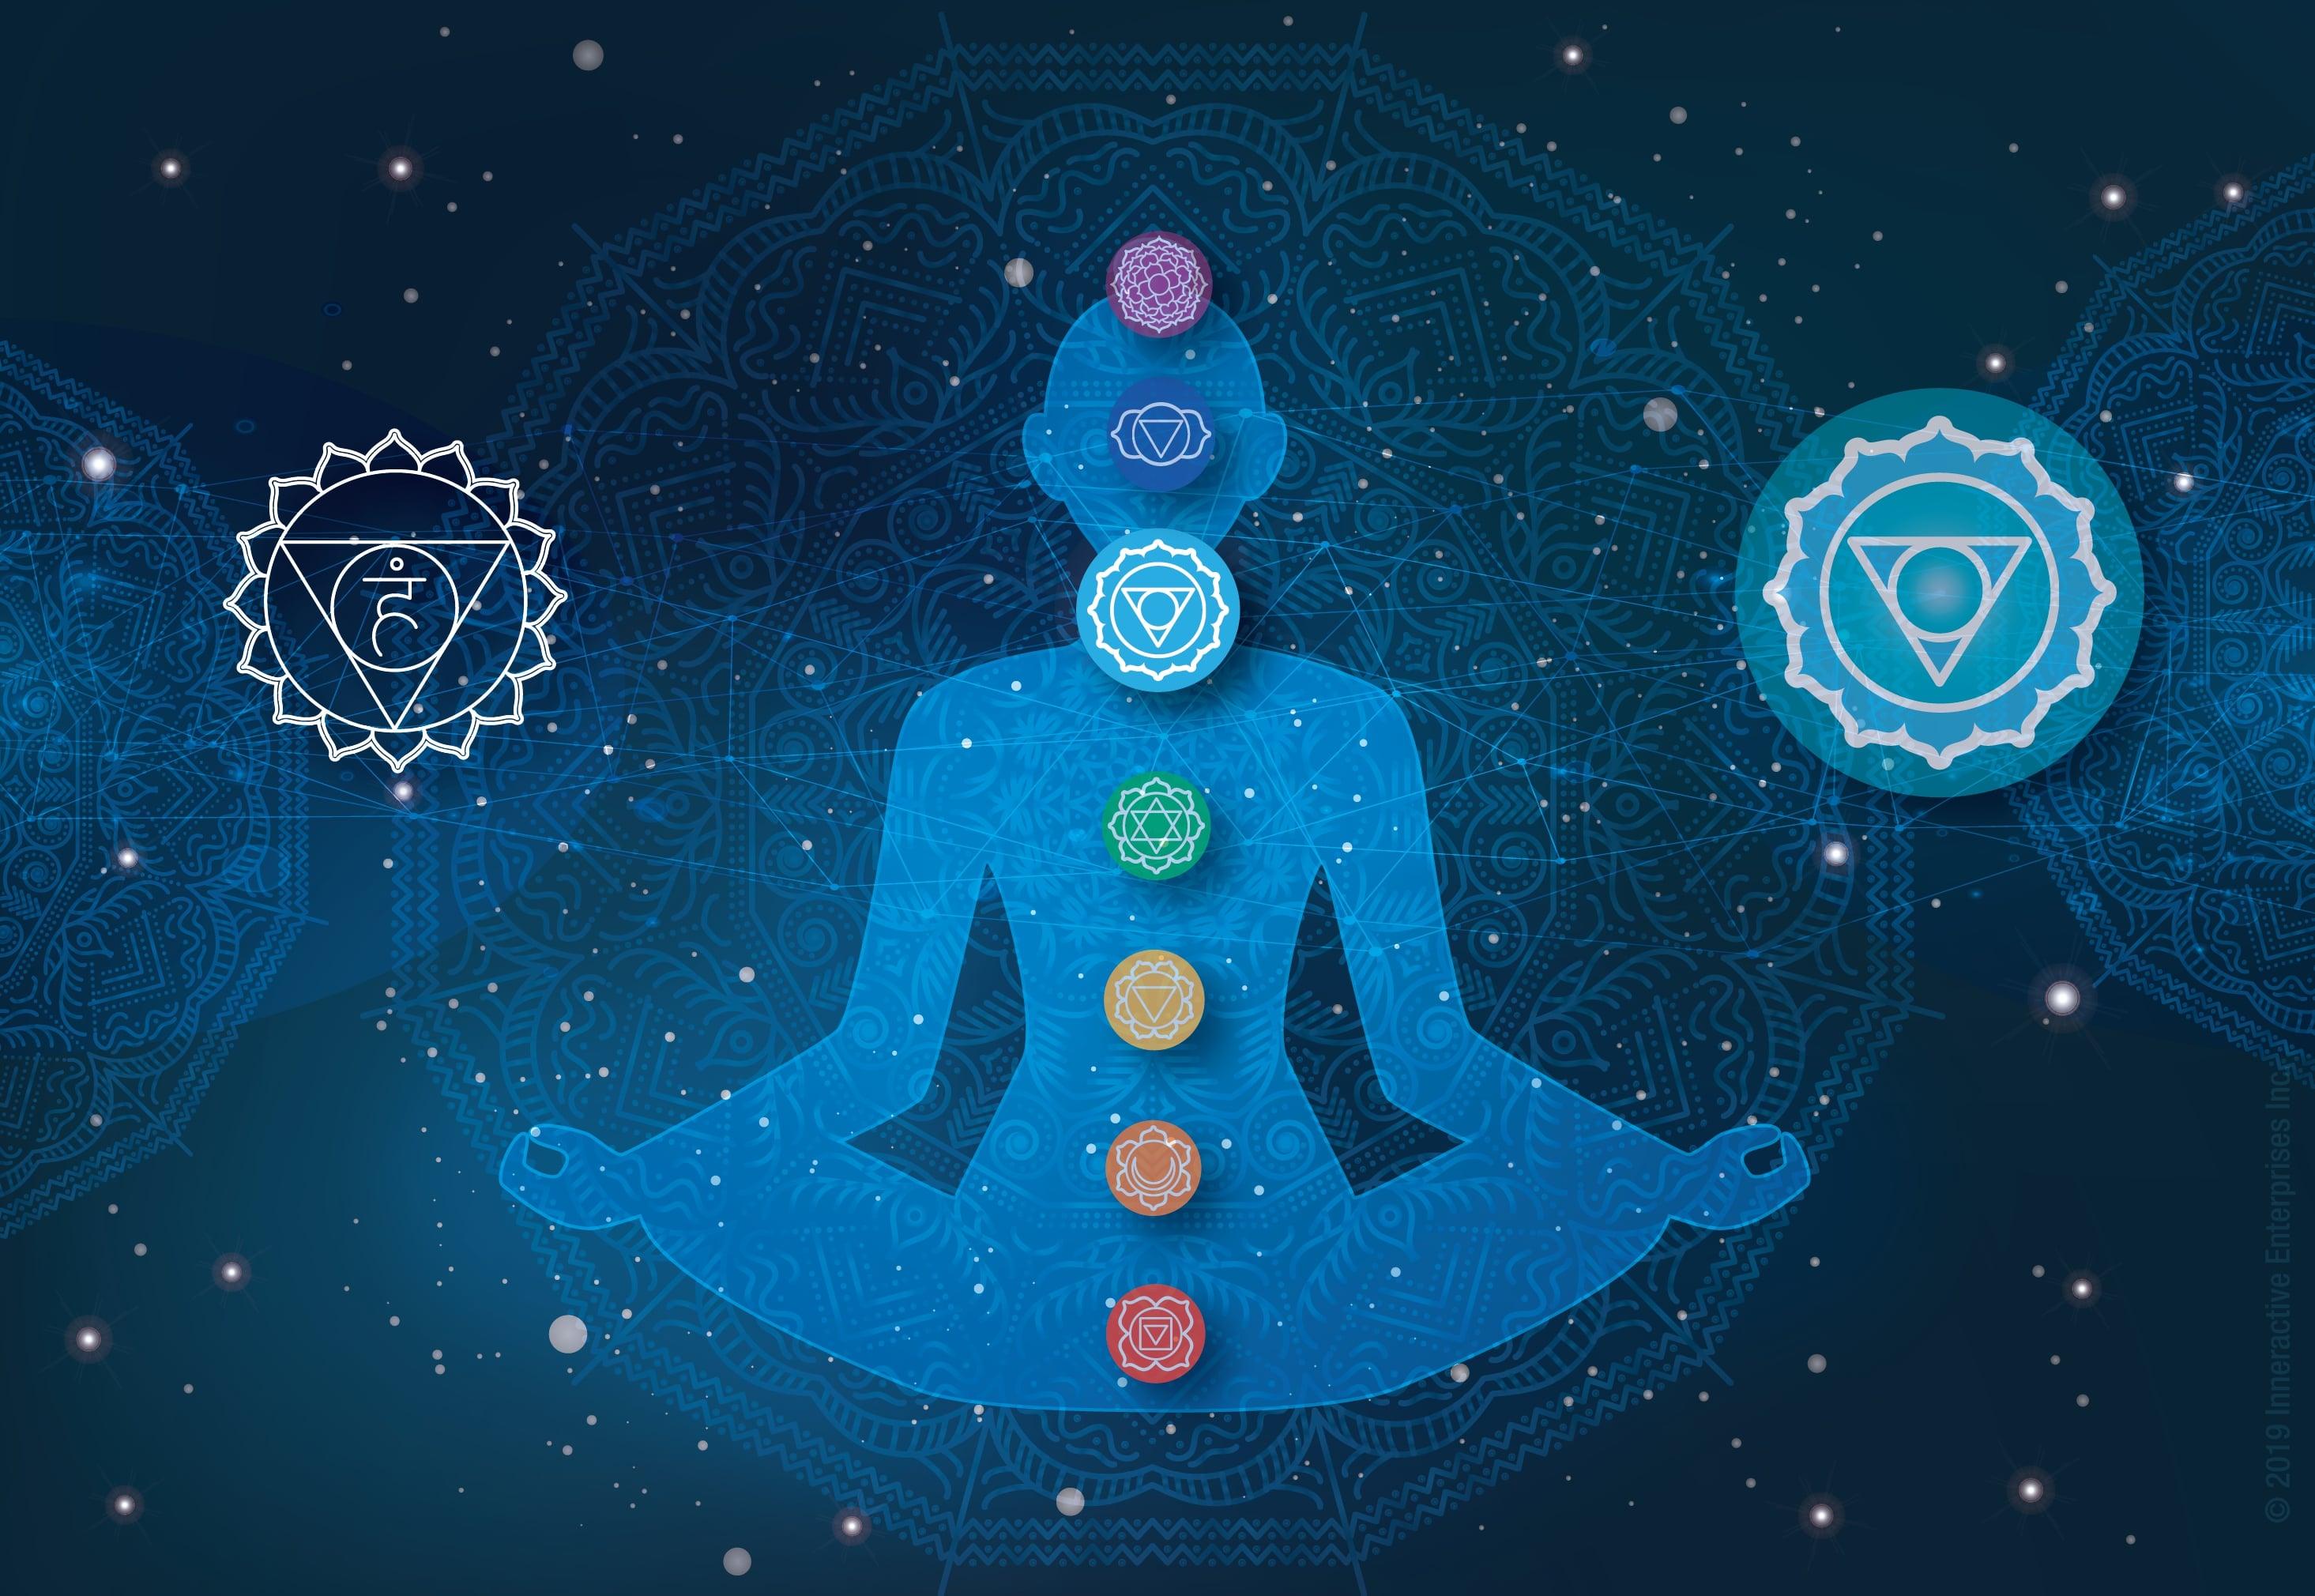 Quinto chakra: Voz, lenguaje y voluntad